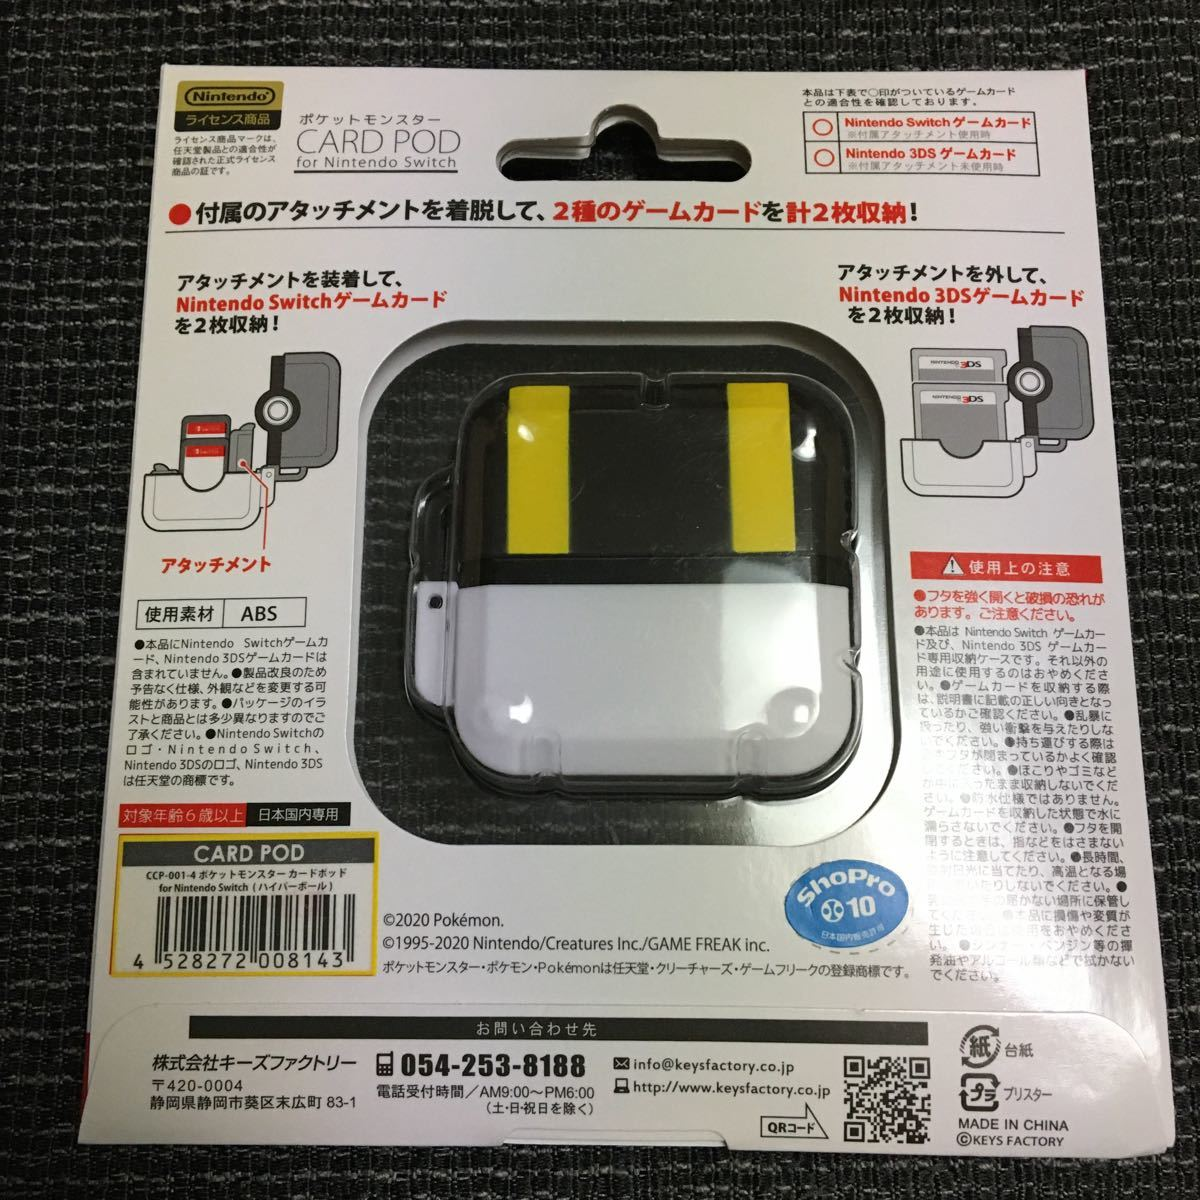 Nintendo Switch ポケットモンスター カードポッド ポケモン ニンテンドースイッチ ゲームカード 収納 3DS スーパーボール ハイパー